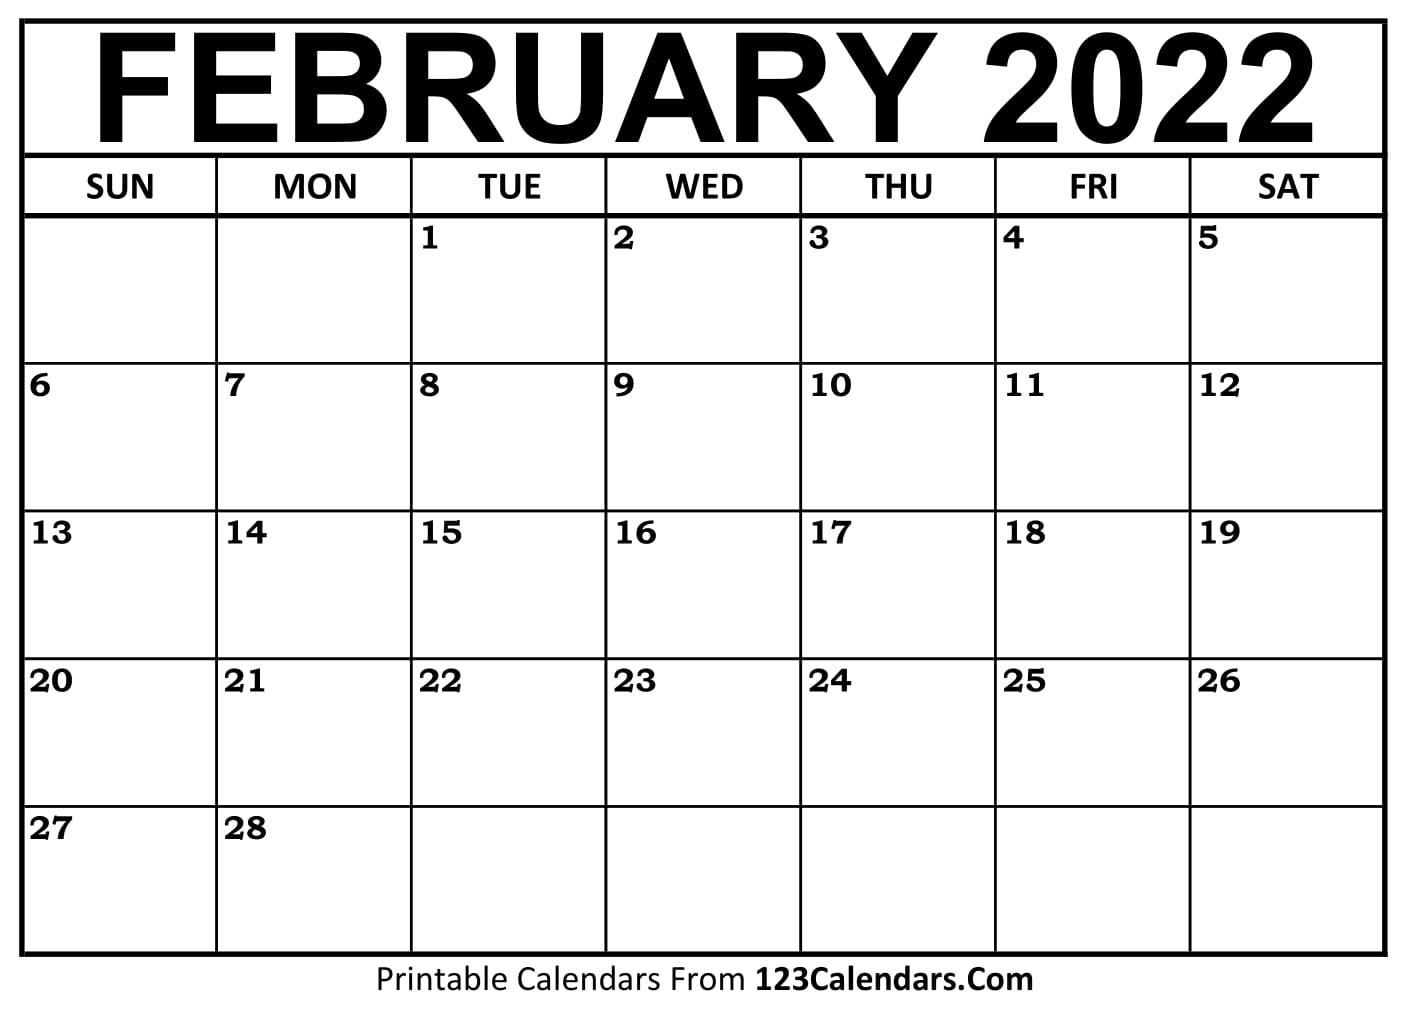 February 2021 Printable Calendar | 123Calendars